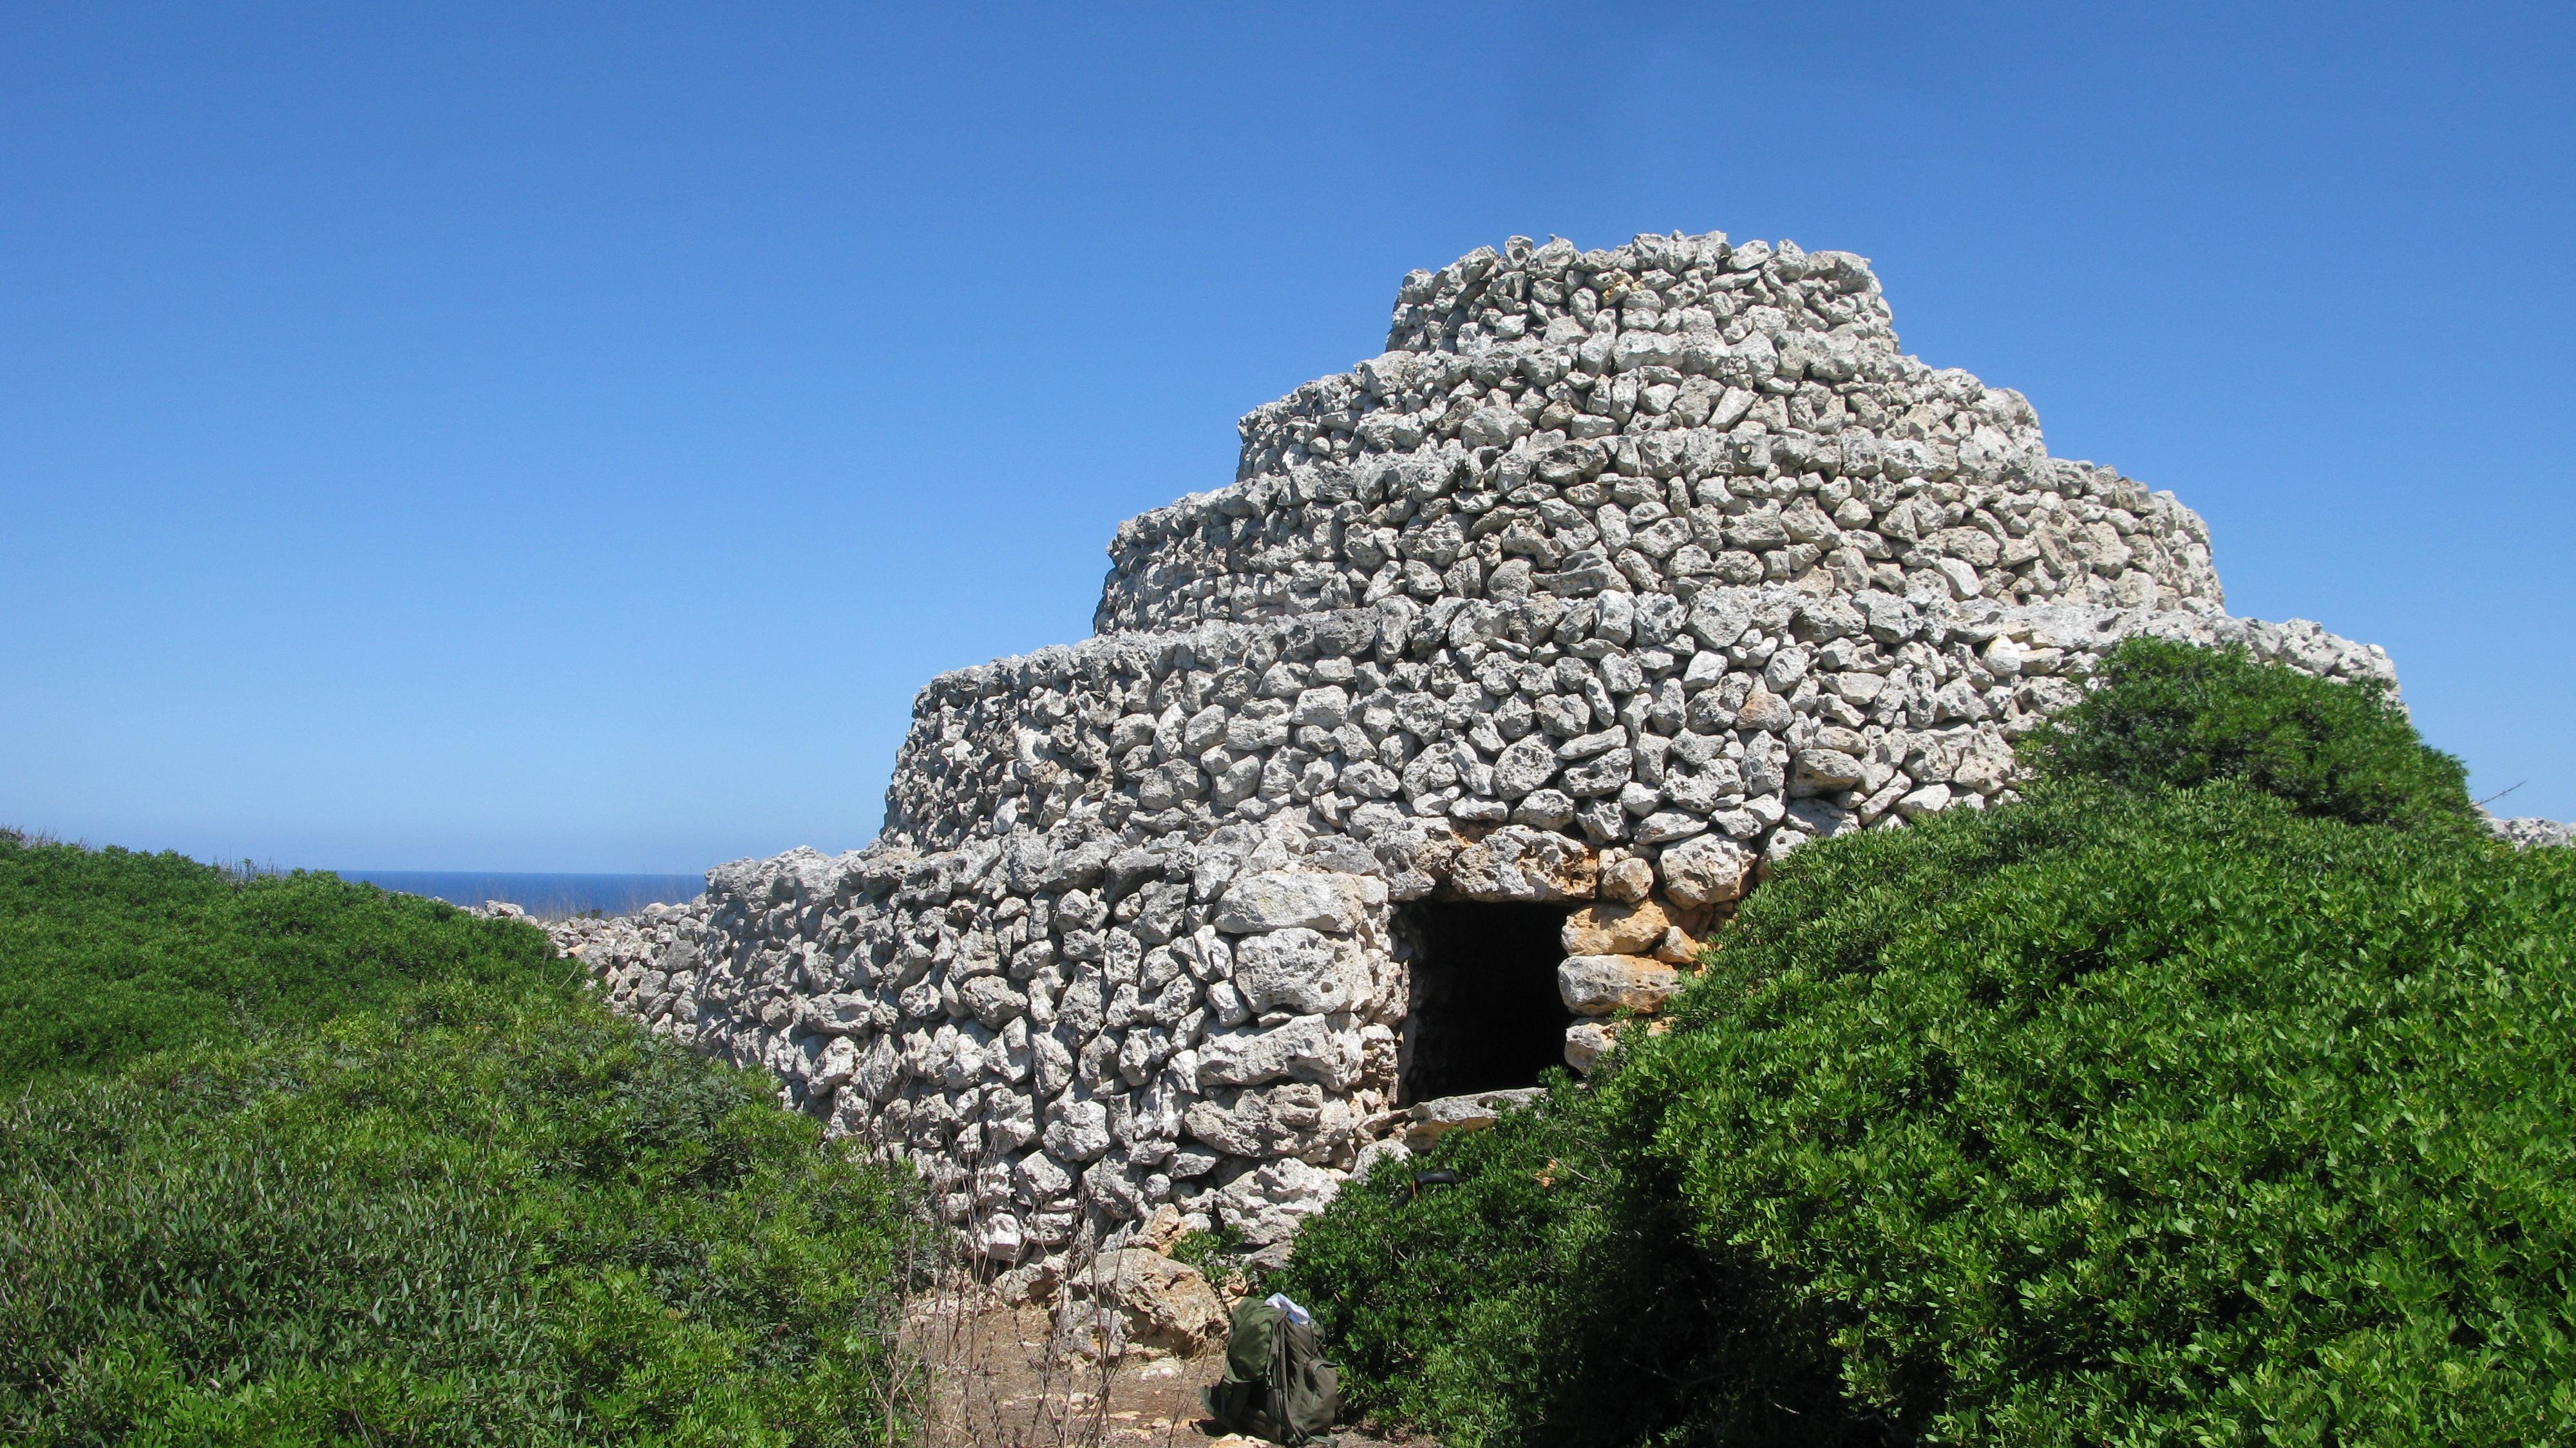 19th century Barraca de bestiar. A tiered stone shelter for animals